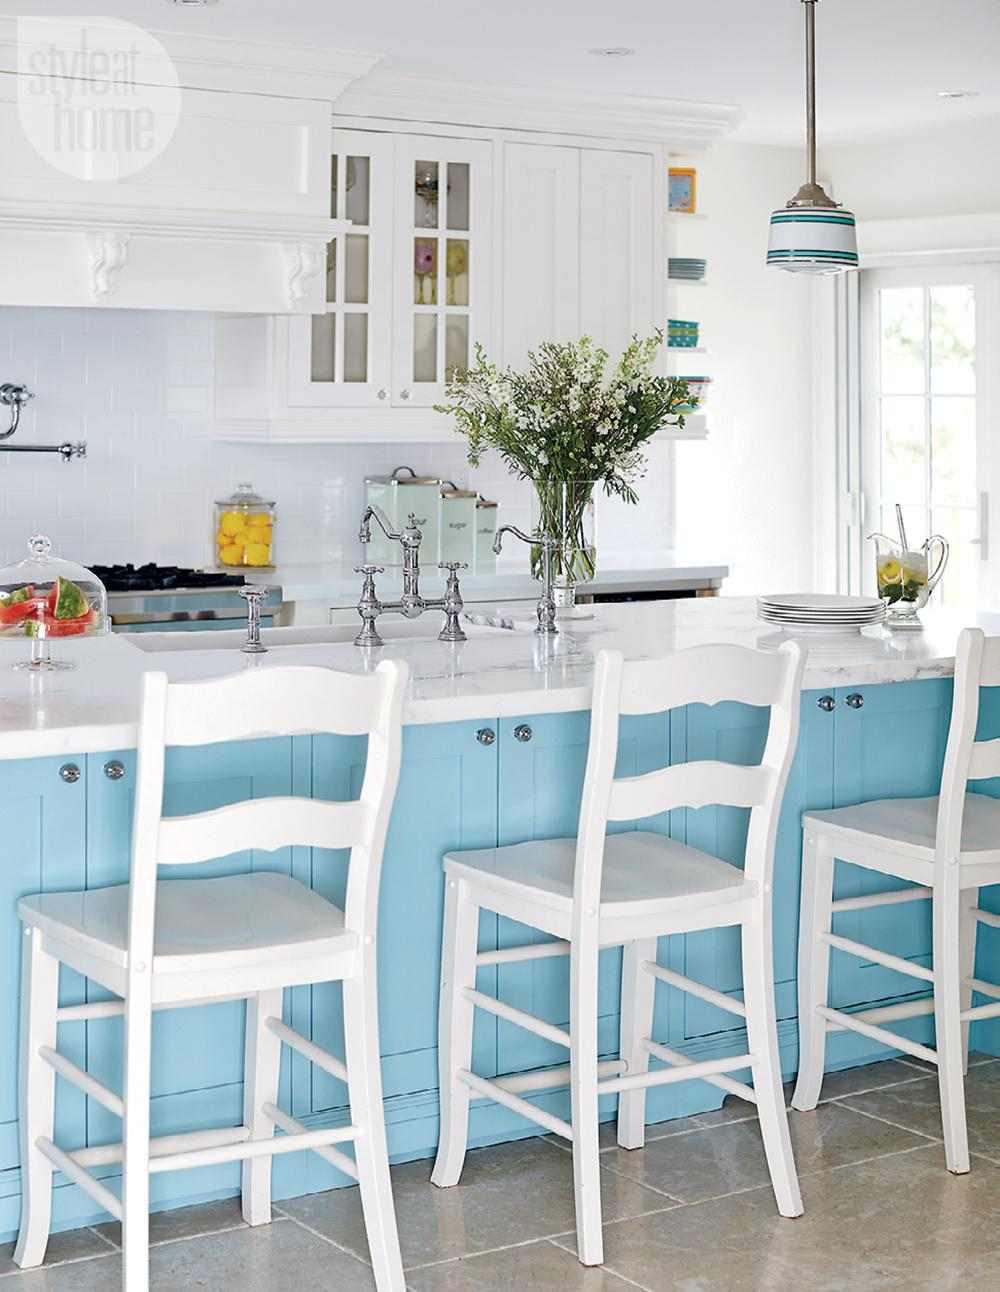 original cocina blanca celeste